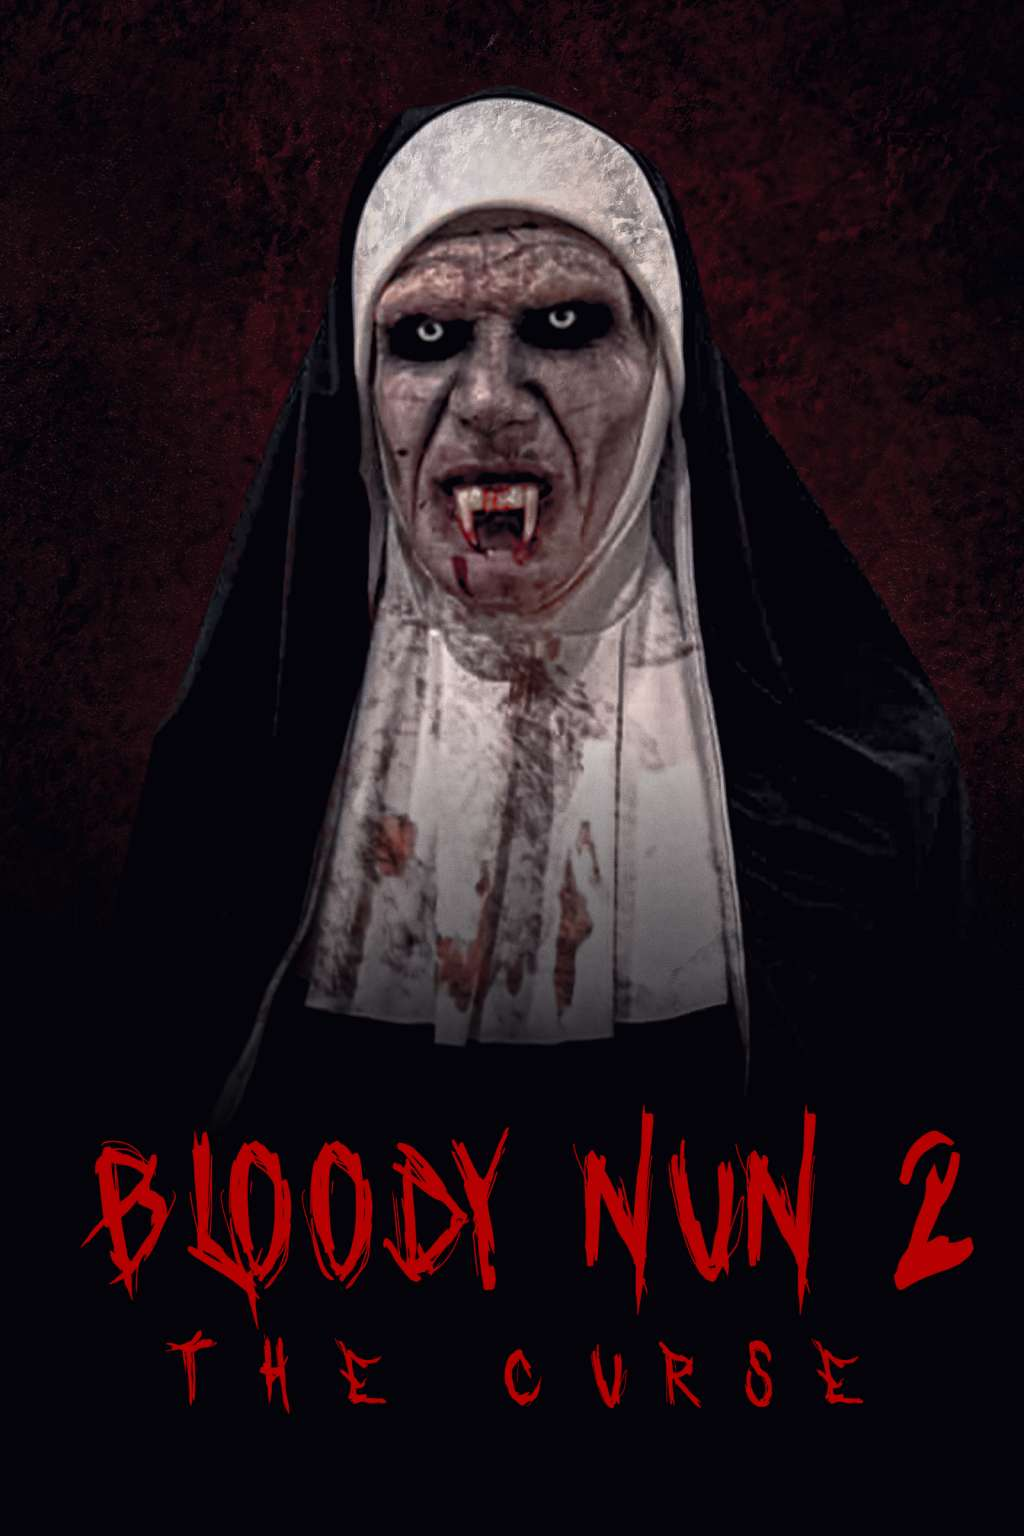 Bloody Nun 2: The Curse kapak